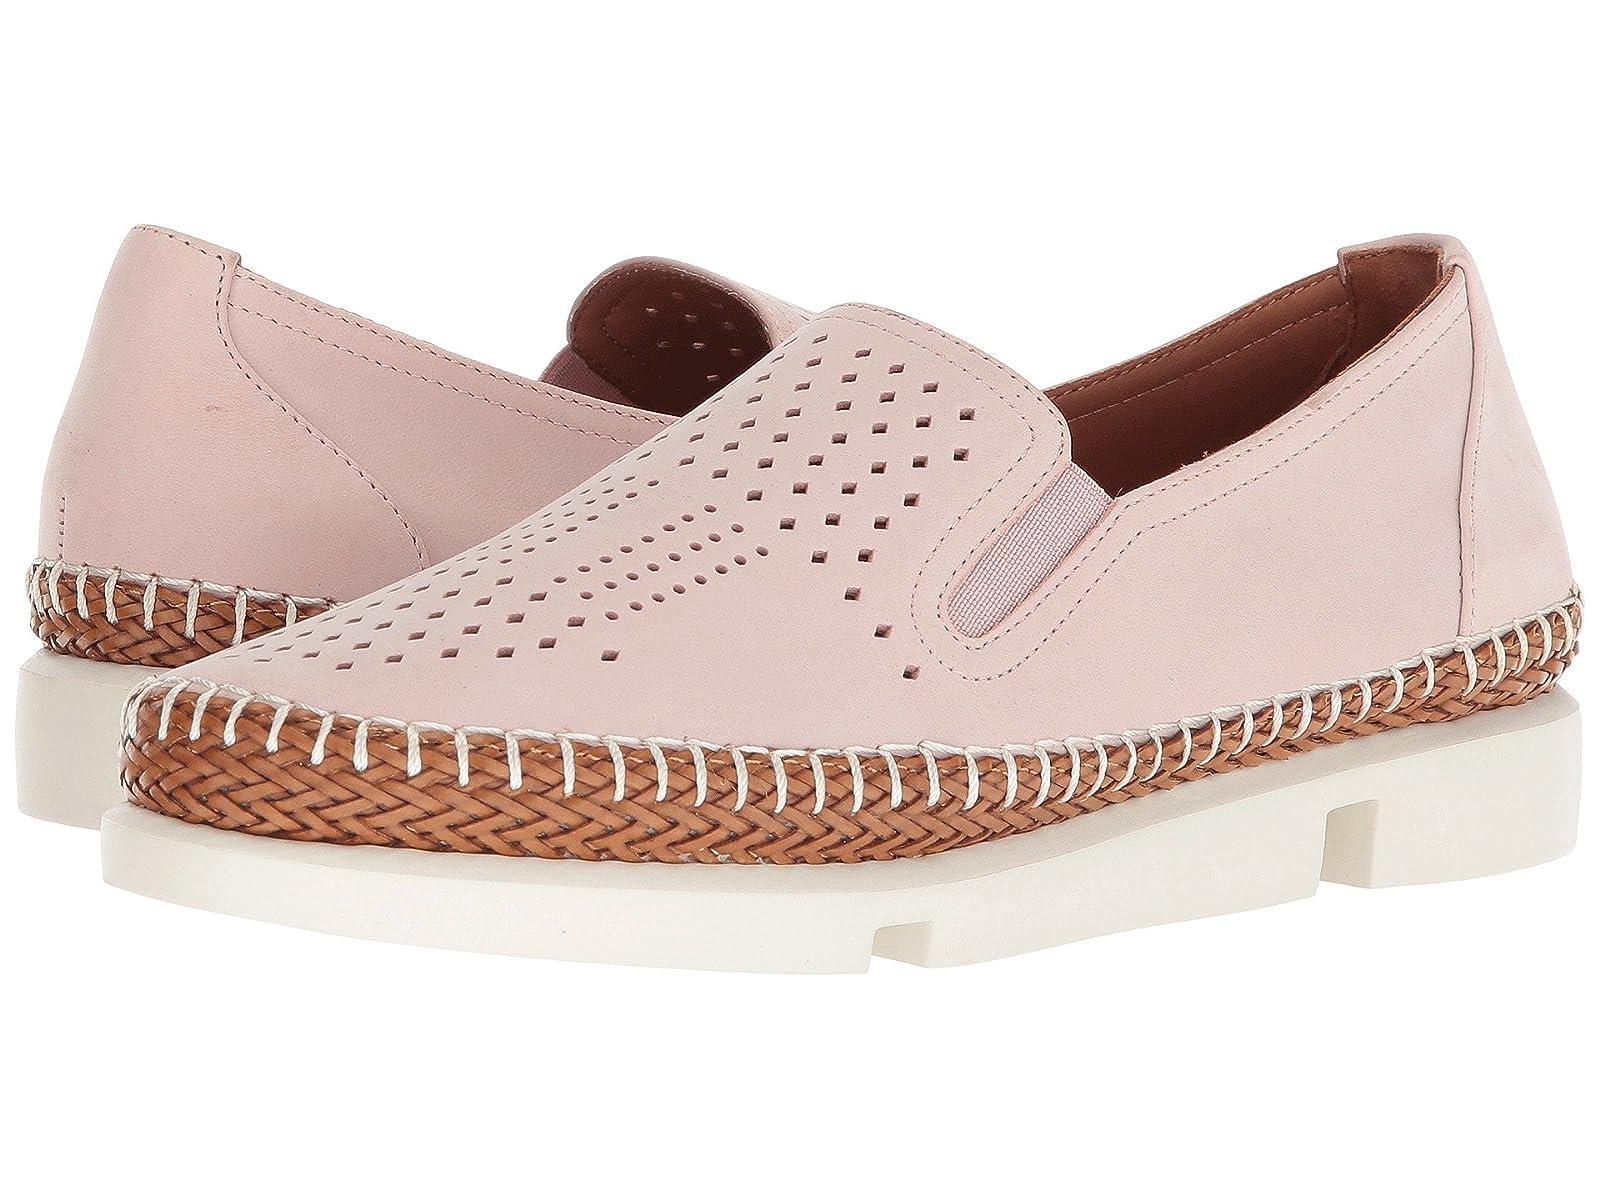 L'Amour Des Pieds StazzemaAtmospheric grades have affordable shoes